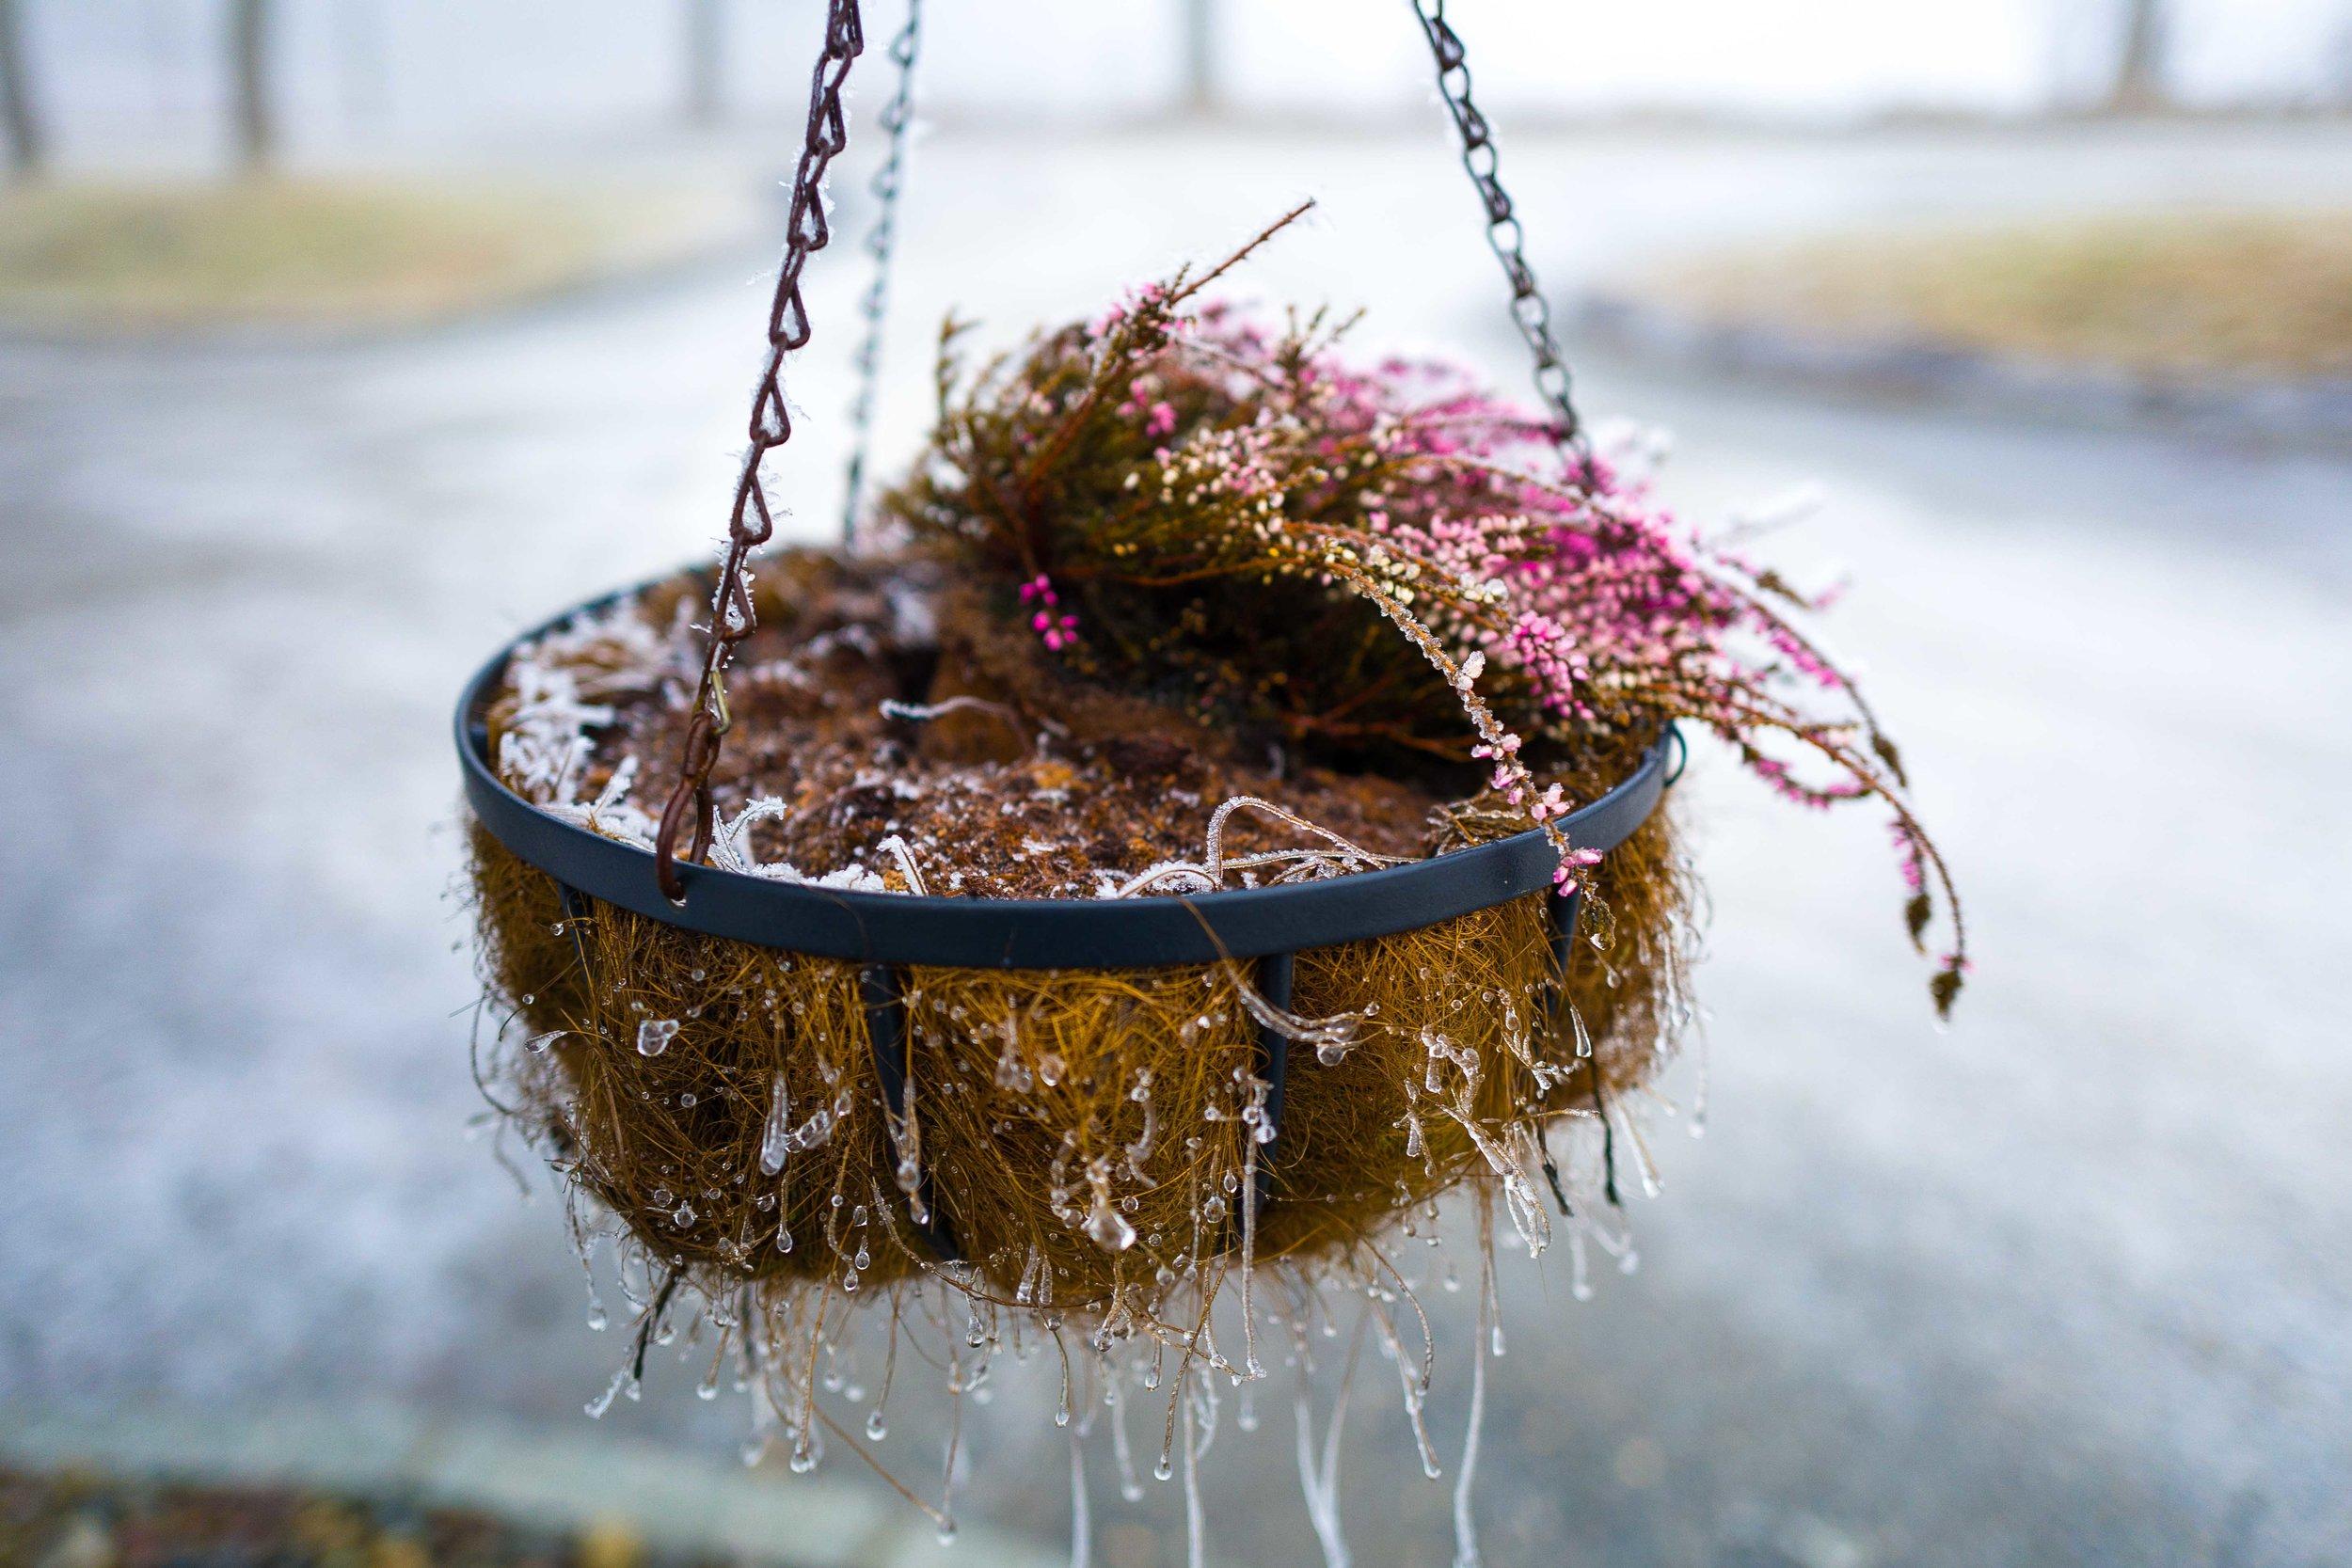 Frozen decorative plant in Norway. Winter 2016. Photo: Daniel Novello